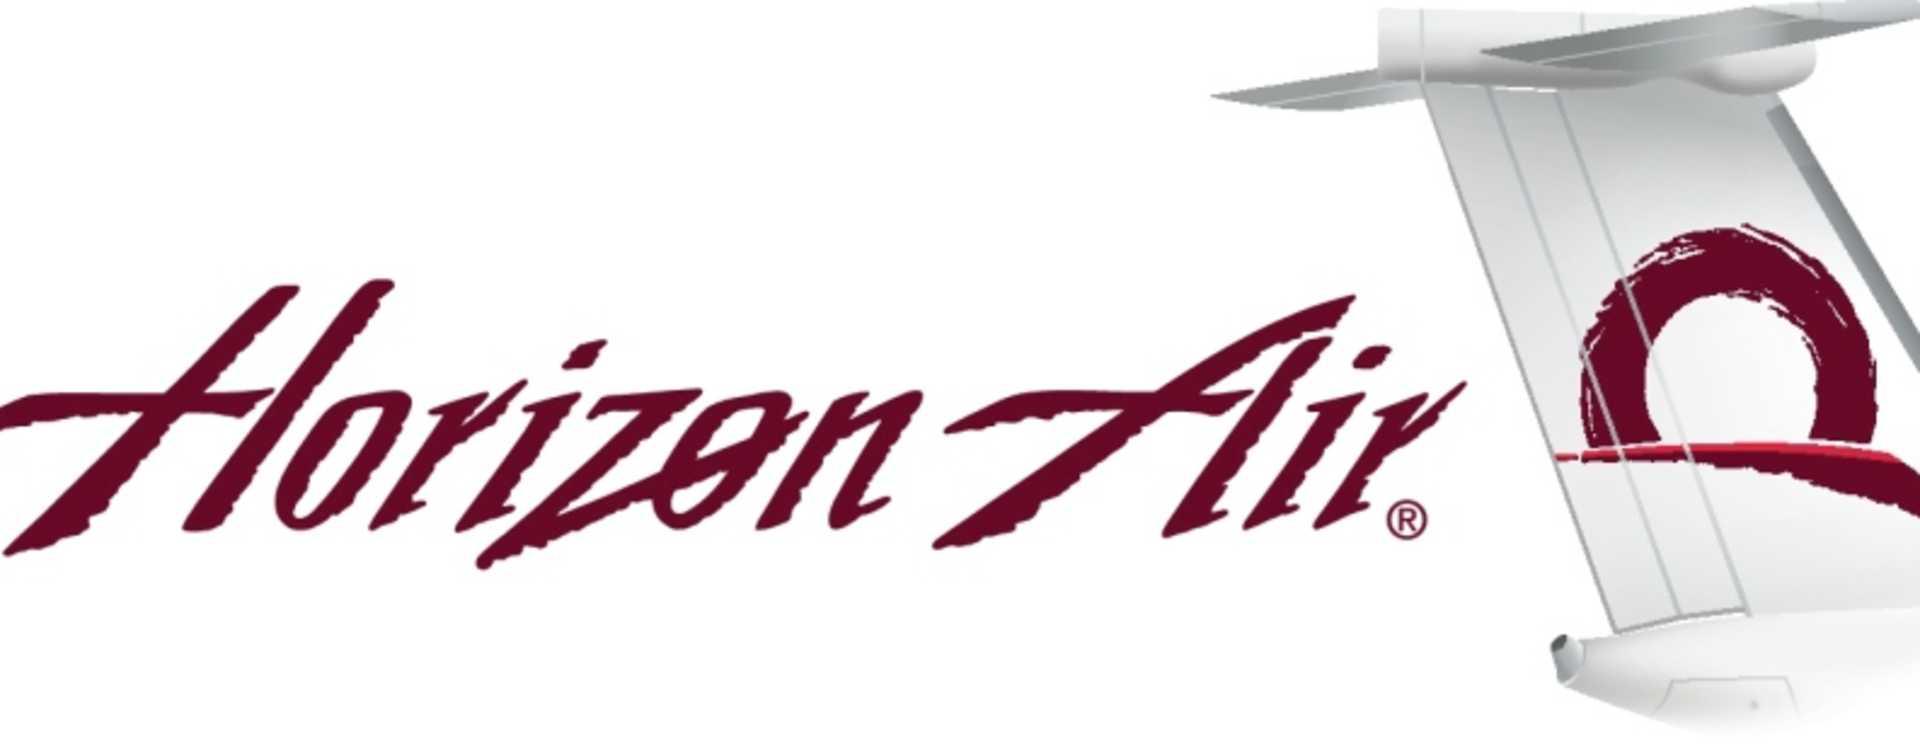 Alaska_Airlines___Horizon_Air-2.jpg